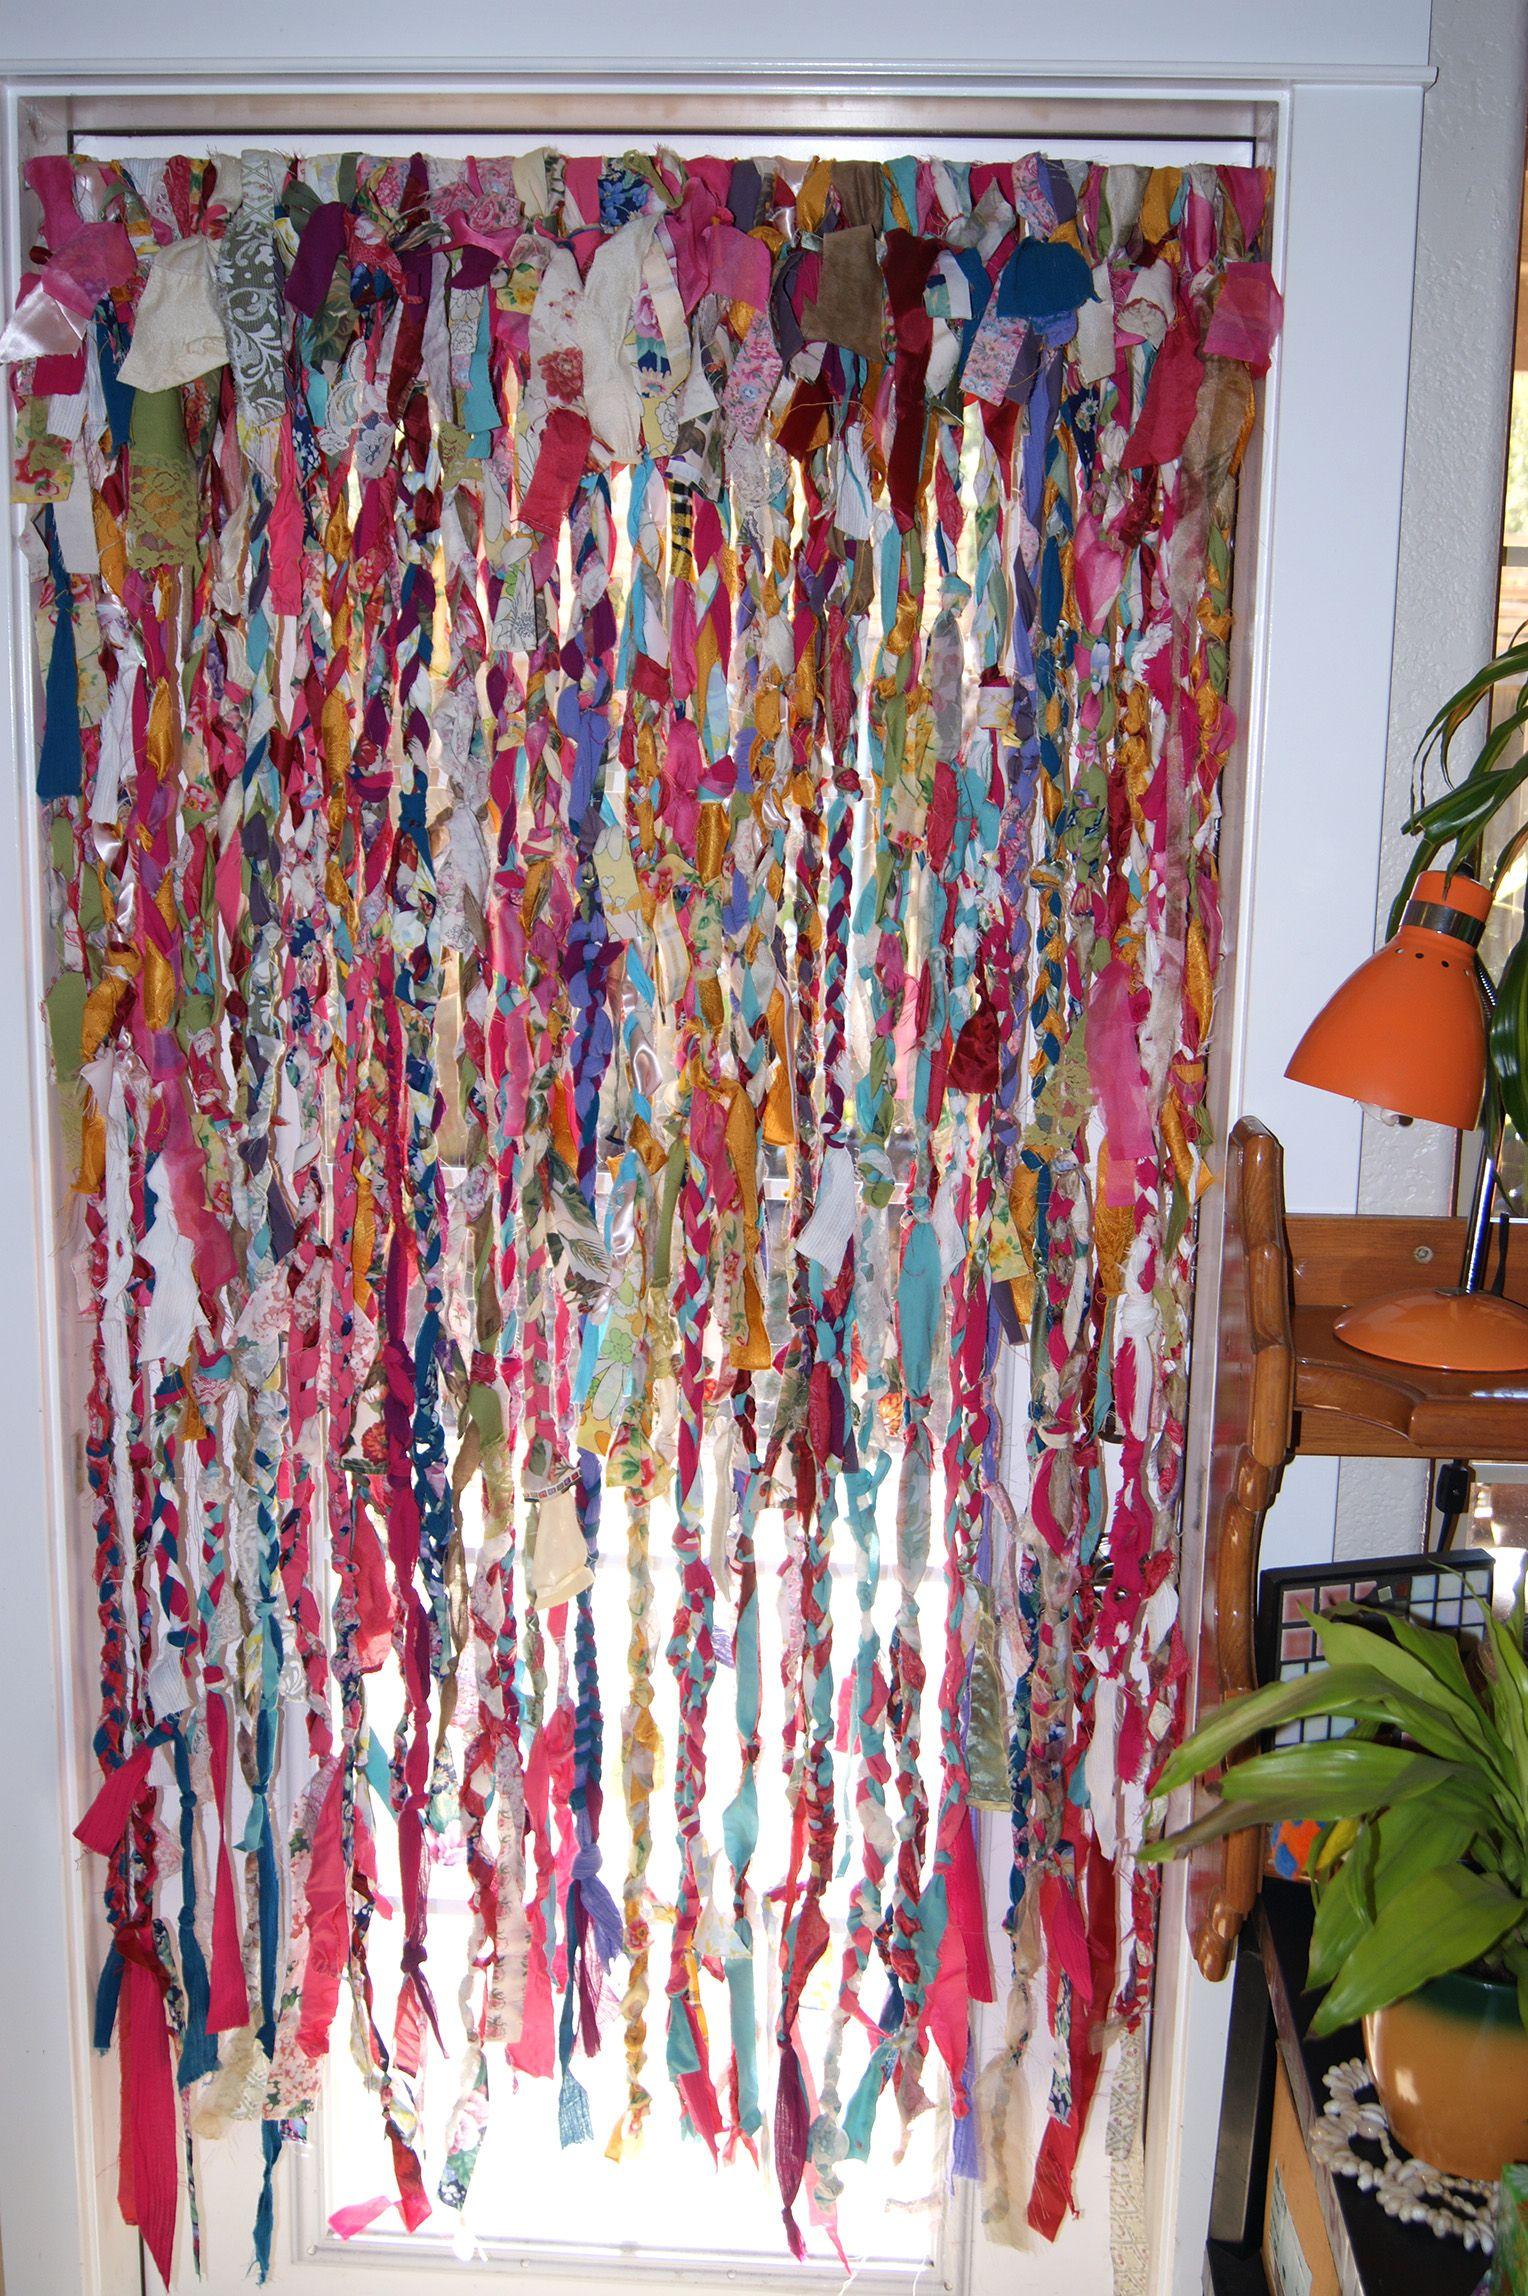 Boho Rag Curtains - Sheets Tablecloths